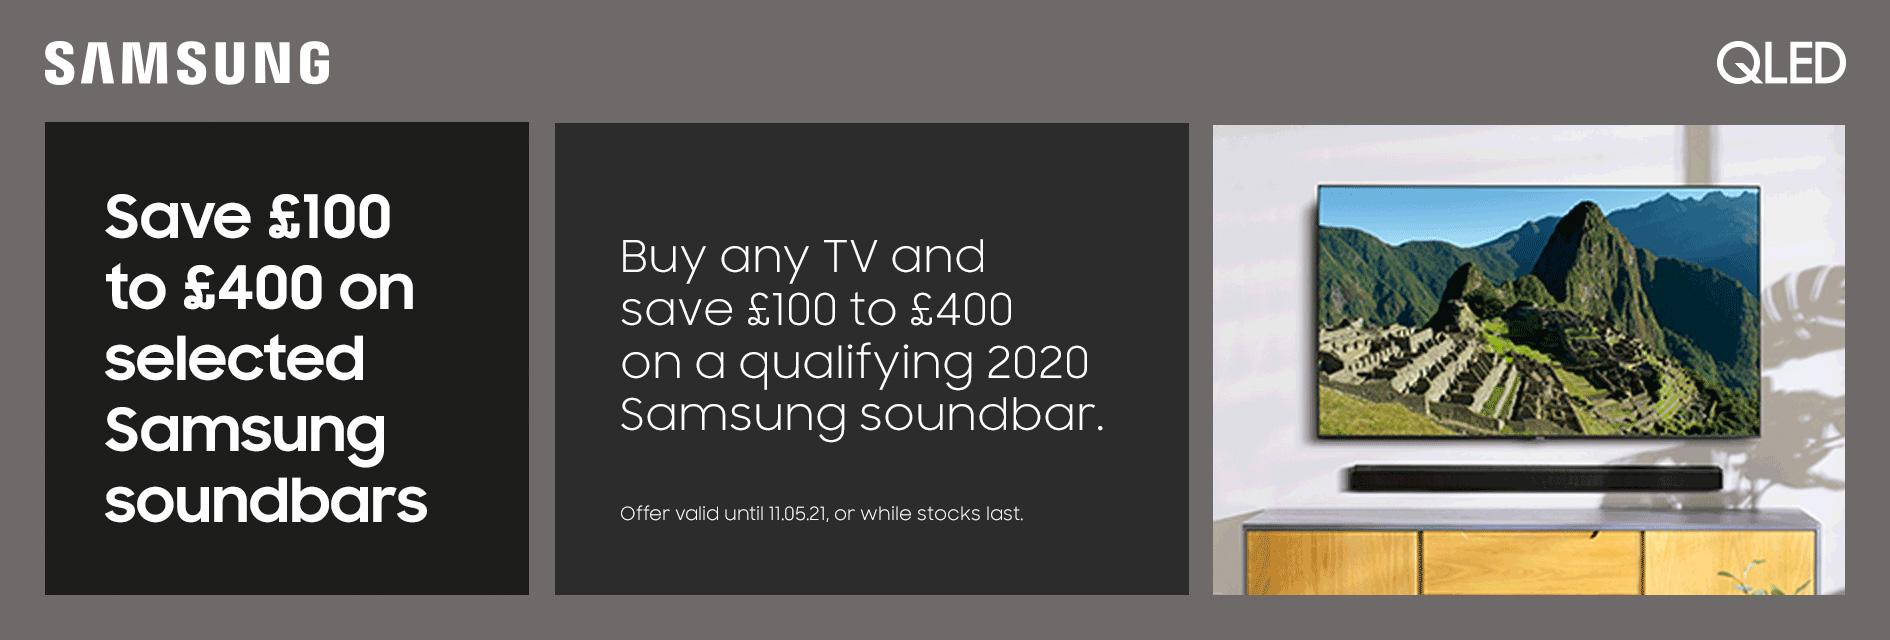 Samsung soundbar saving 03/21